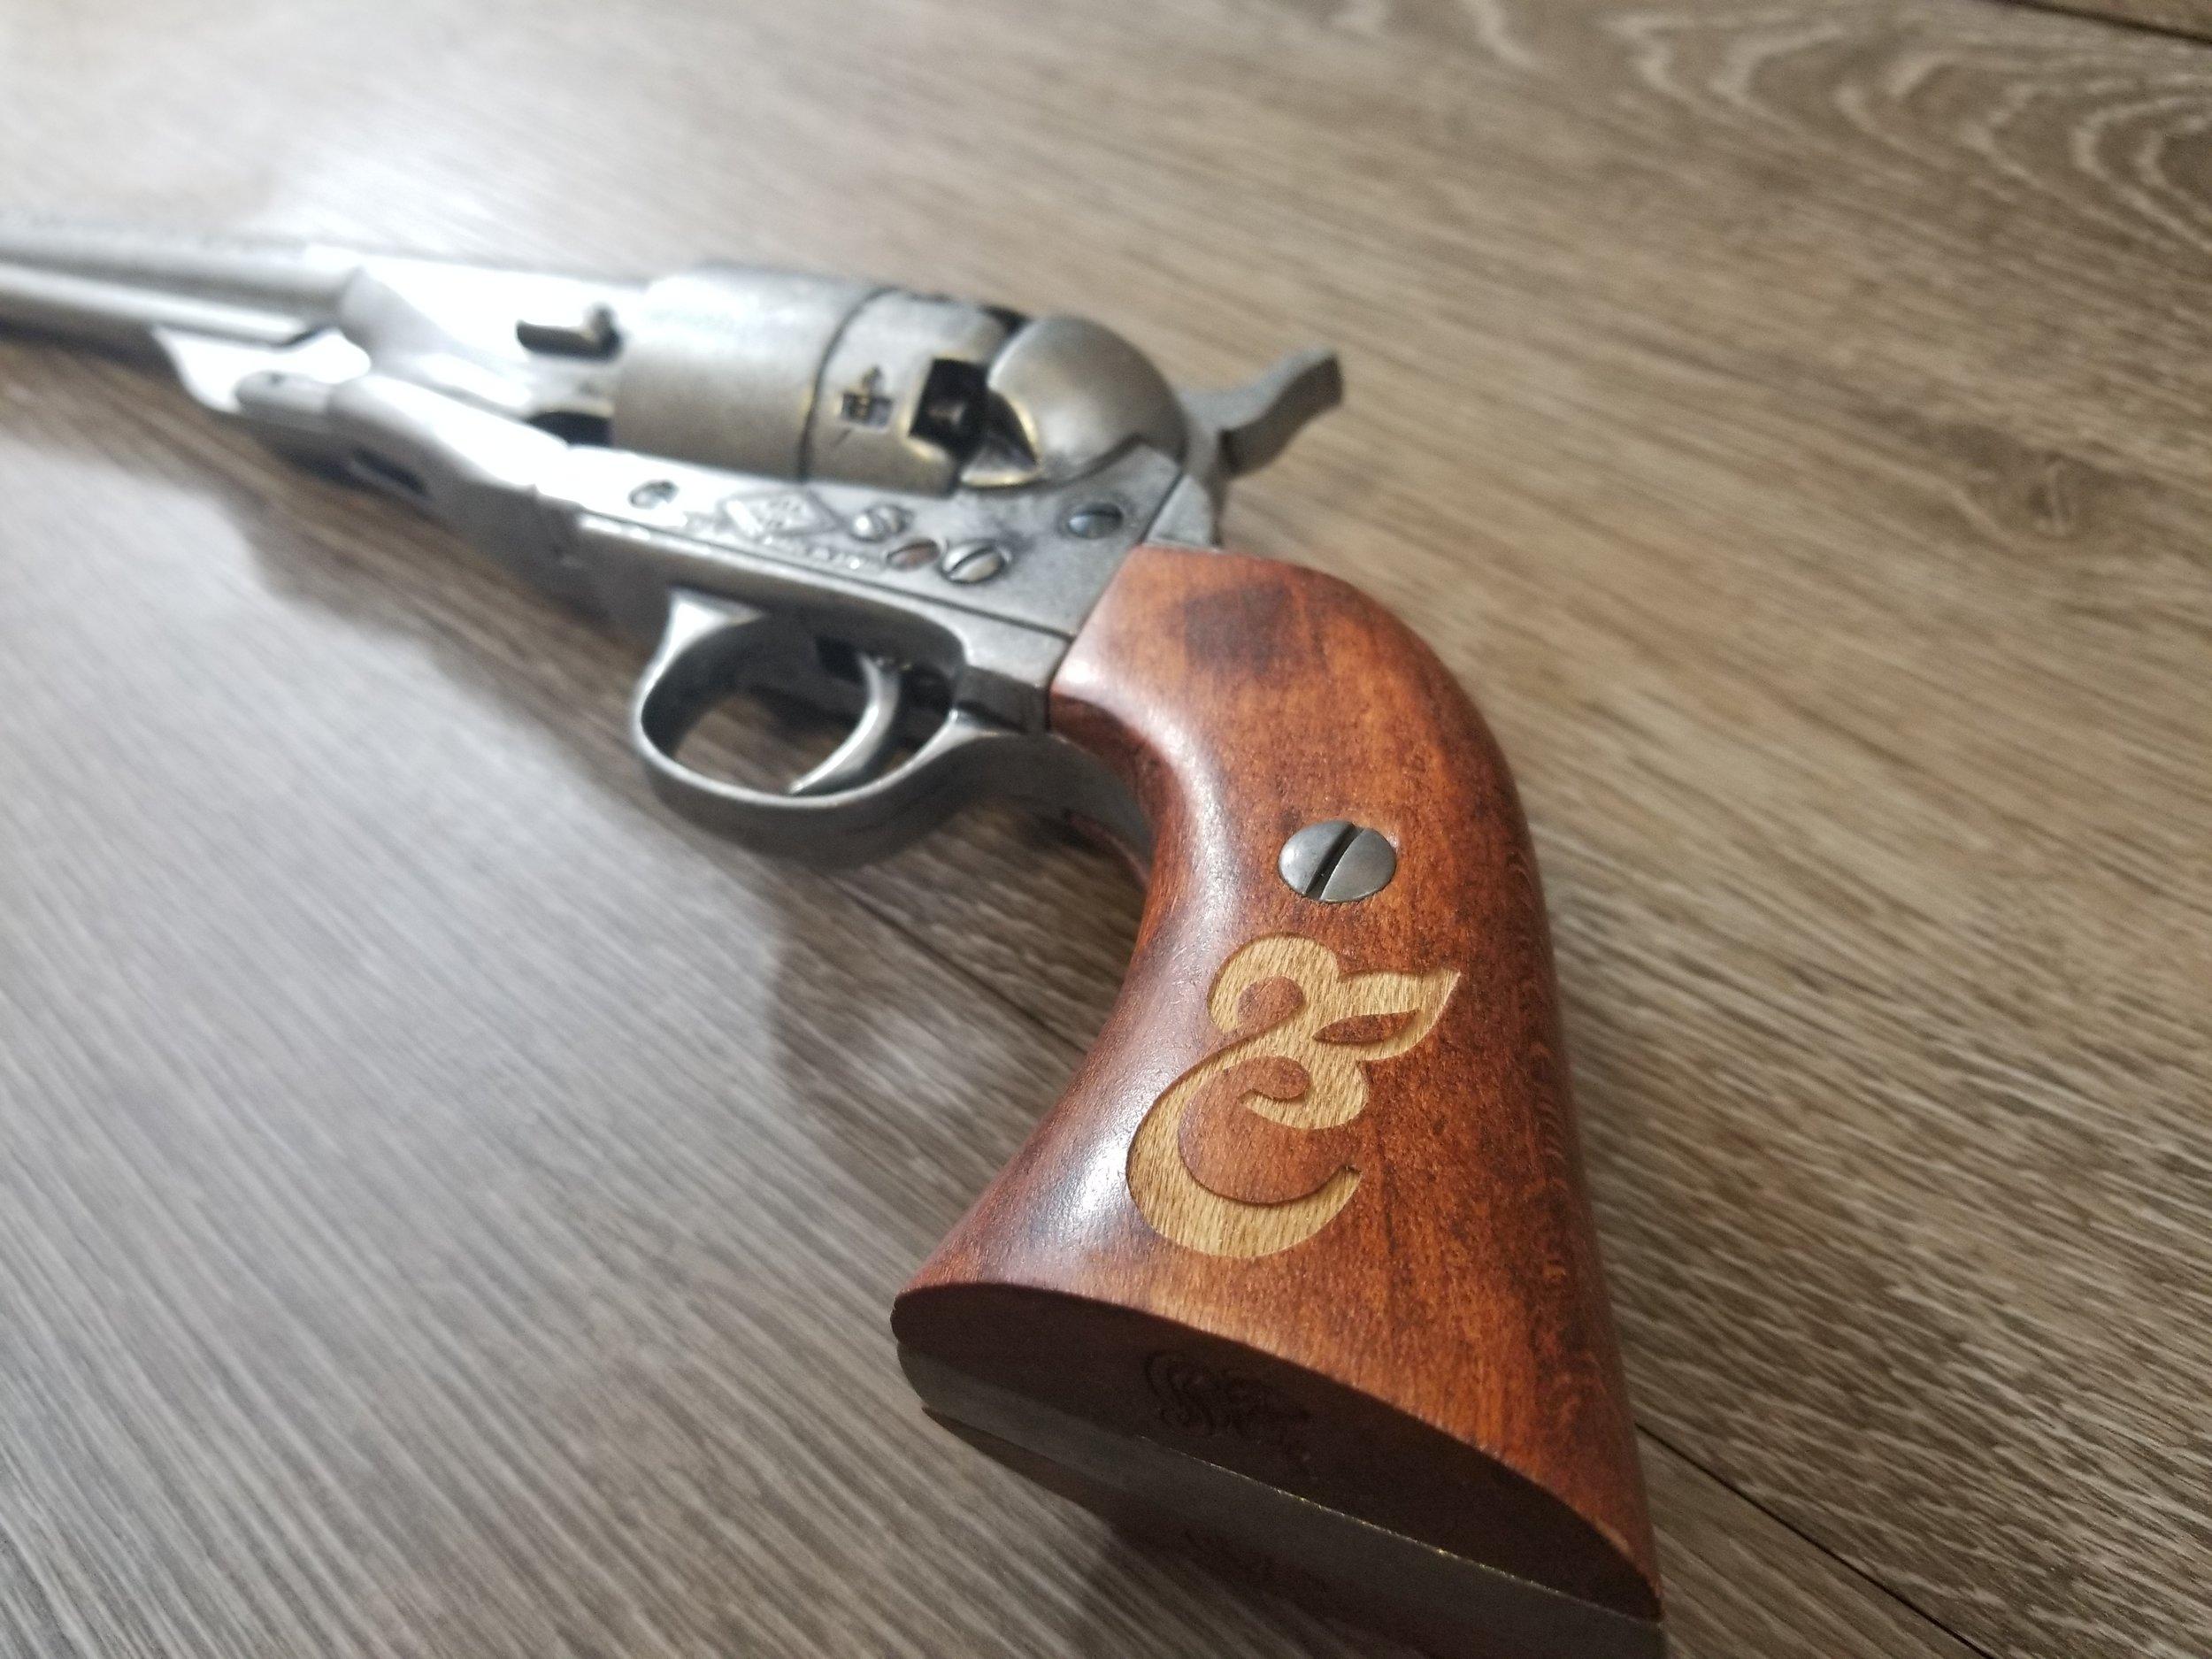 Copy of Custom Engraved Pistol Grip - Personalized Pistol Grip - Firearm Projects from Engrave It Houston